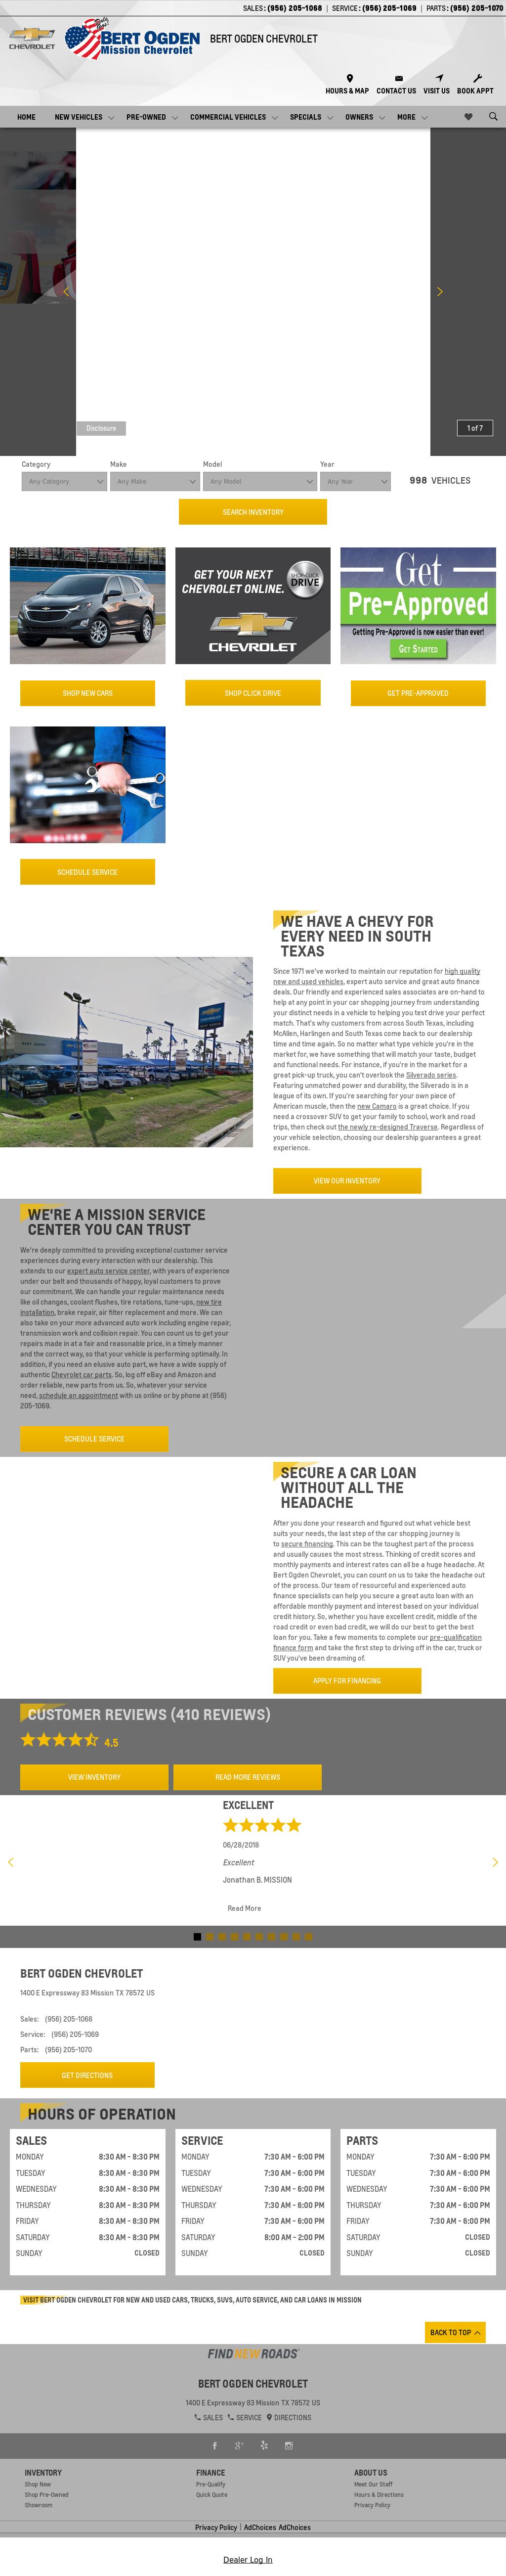 Bert Ogden Chevrolet Website History